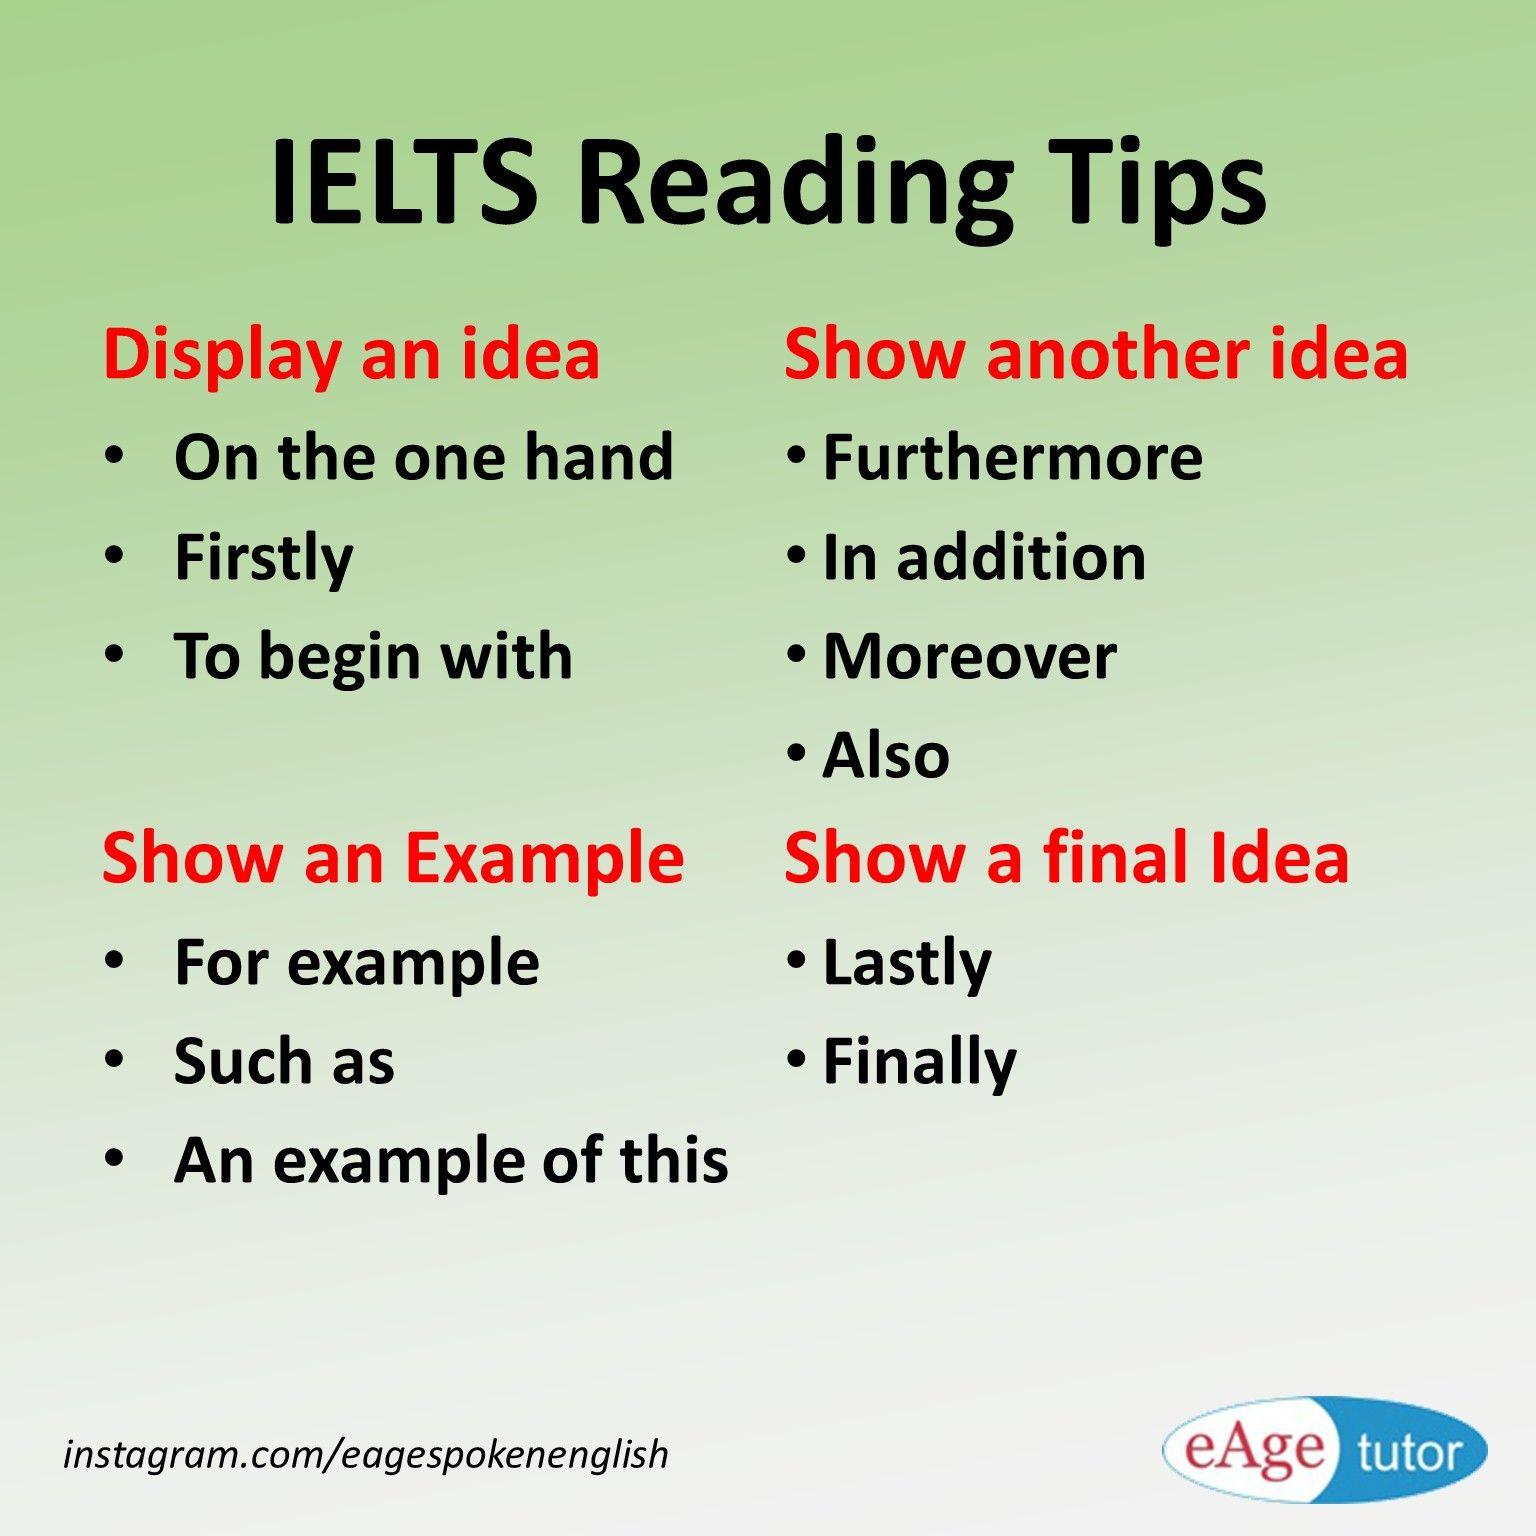 Page Ahead Children's Literacy Program | Children's Literacy: Tips ...